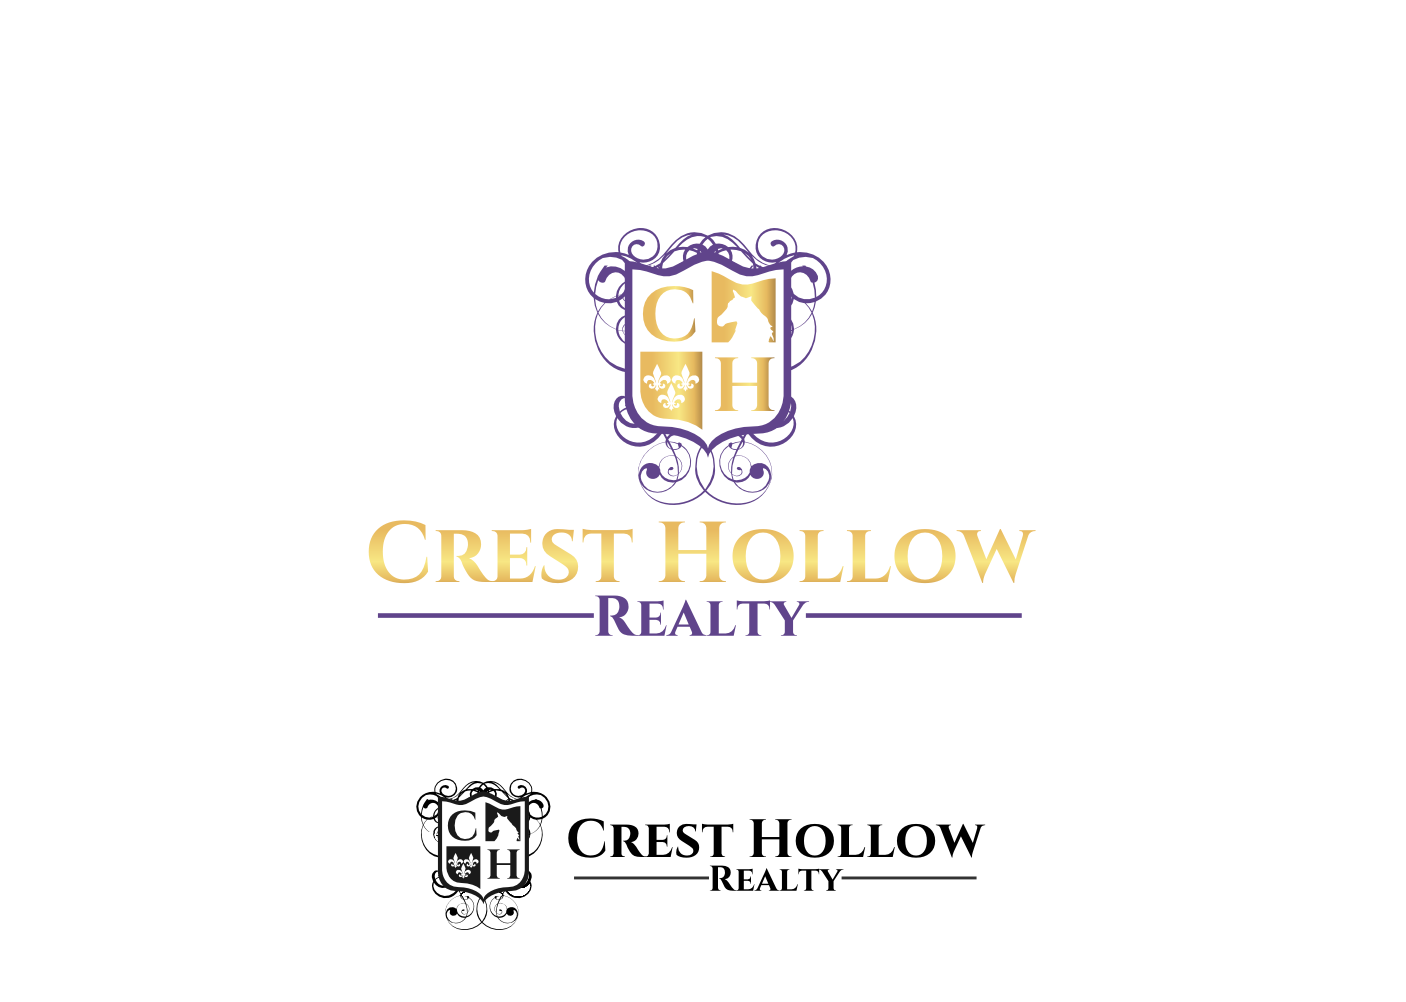 Elegant, Serious Logo Design for Crest Hollow Realty by Gita